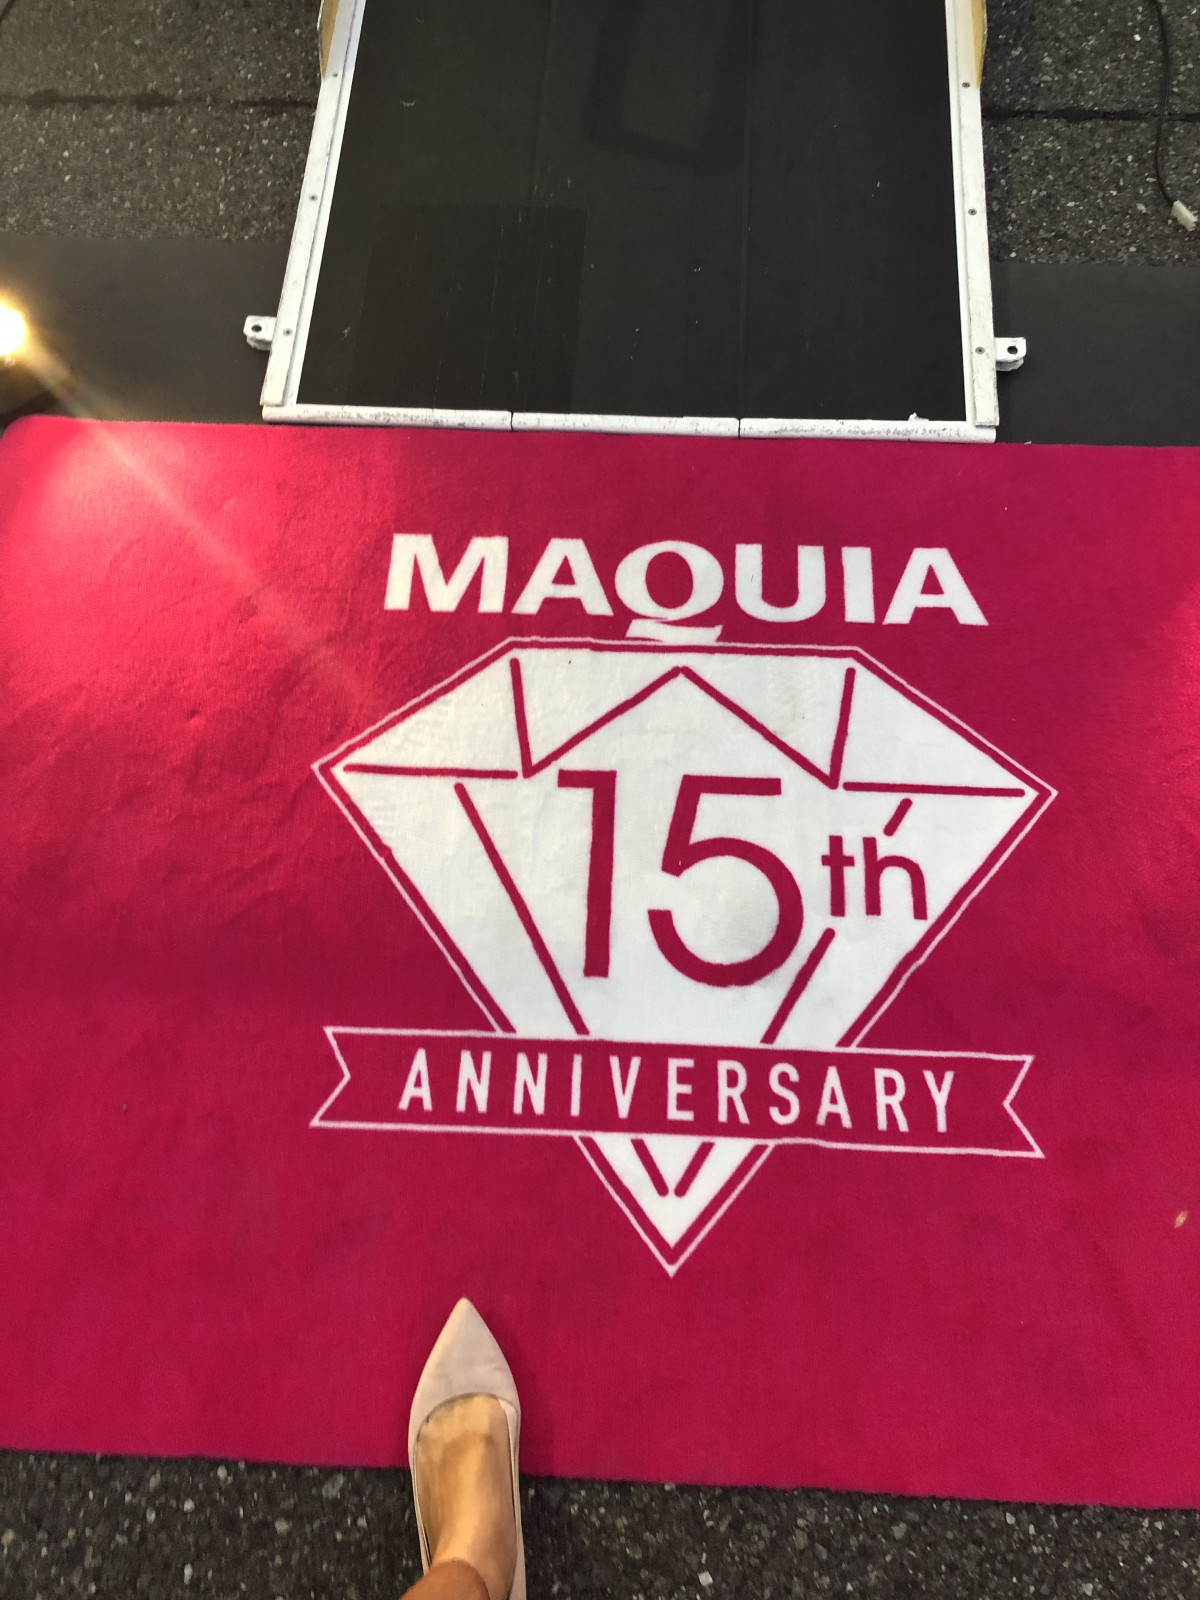 【MAQUIA15周年★ビューティシェアクルーズ】アスタリフトセミナー